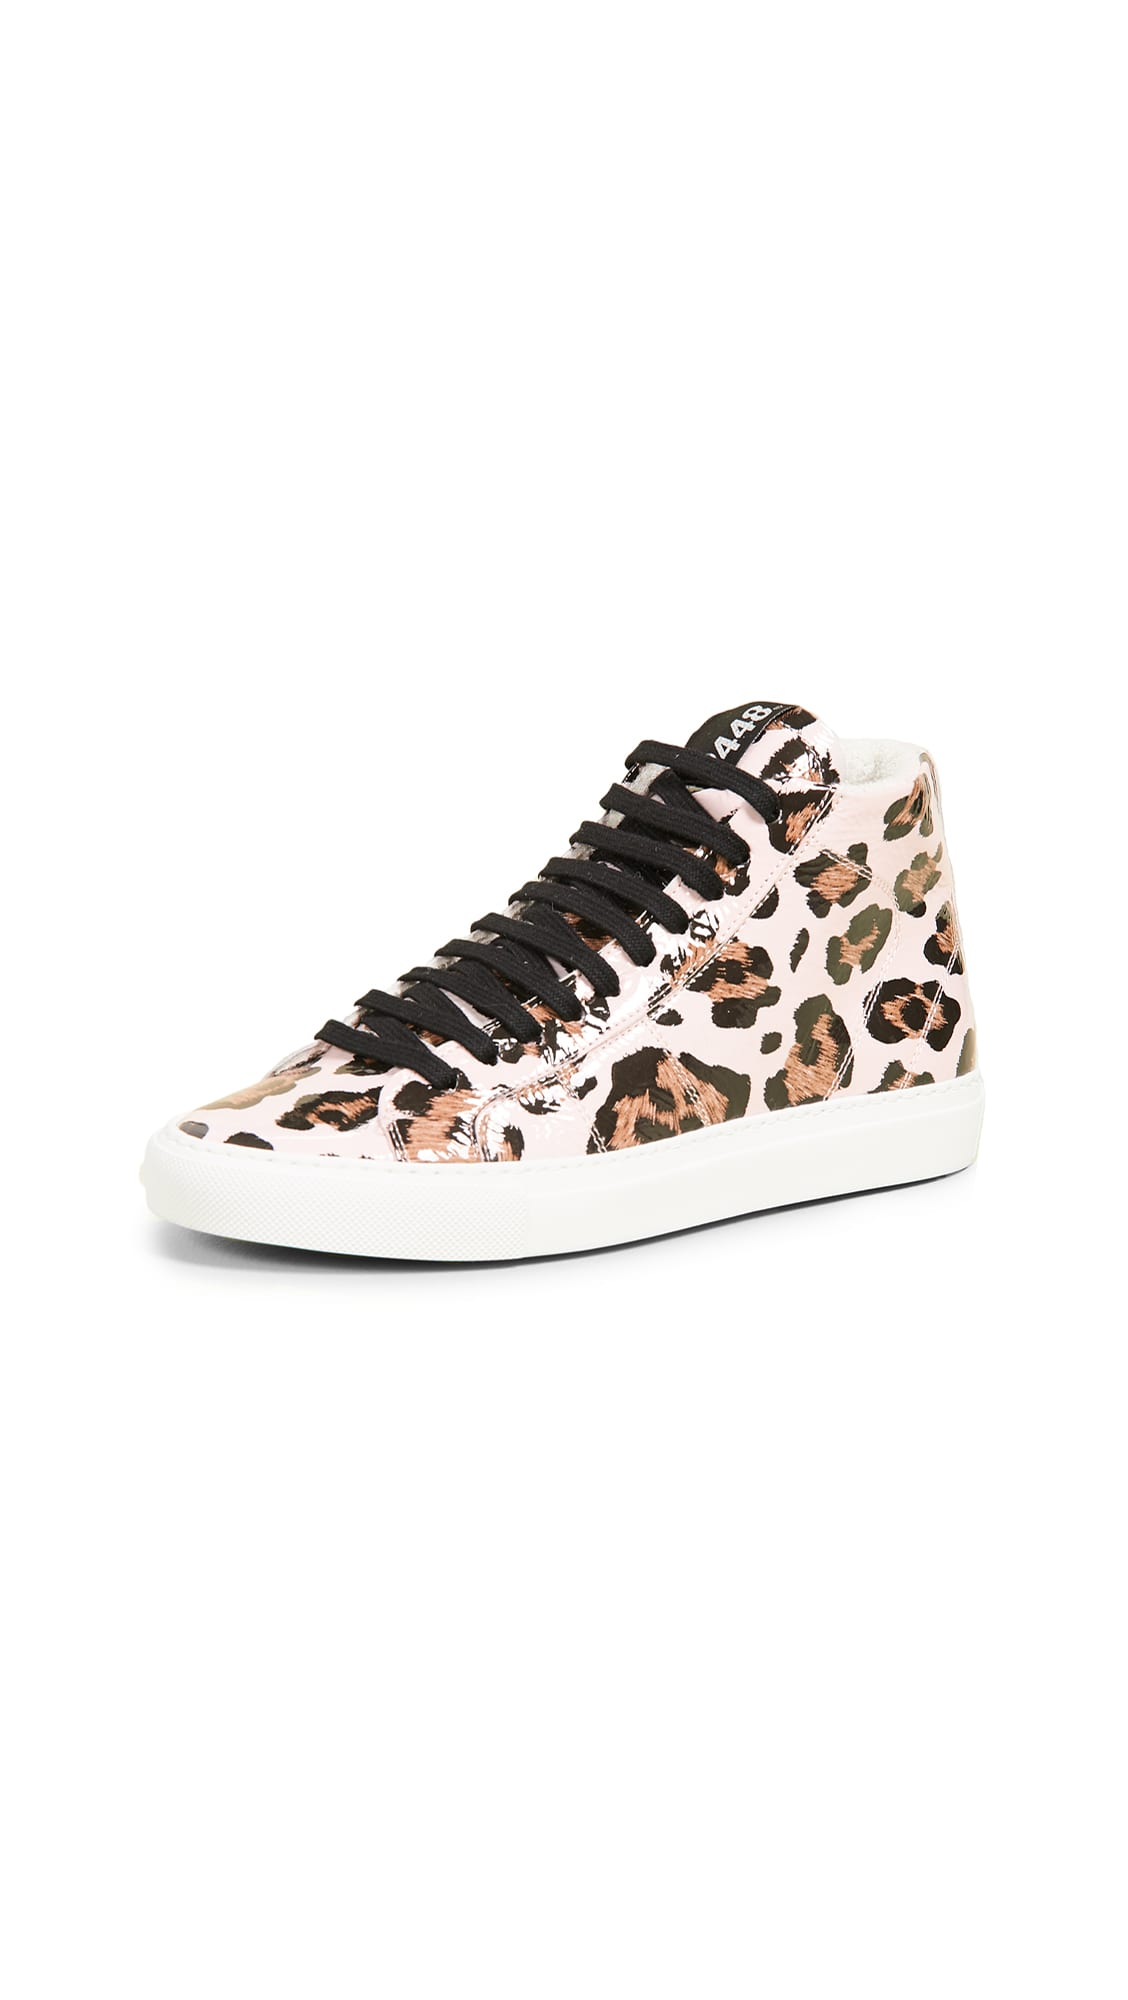 shopbop P448 Star Sneakers